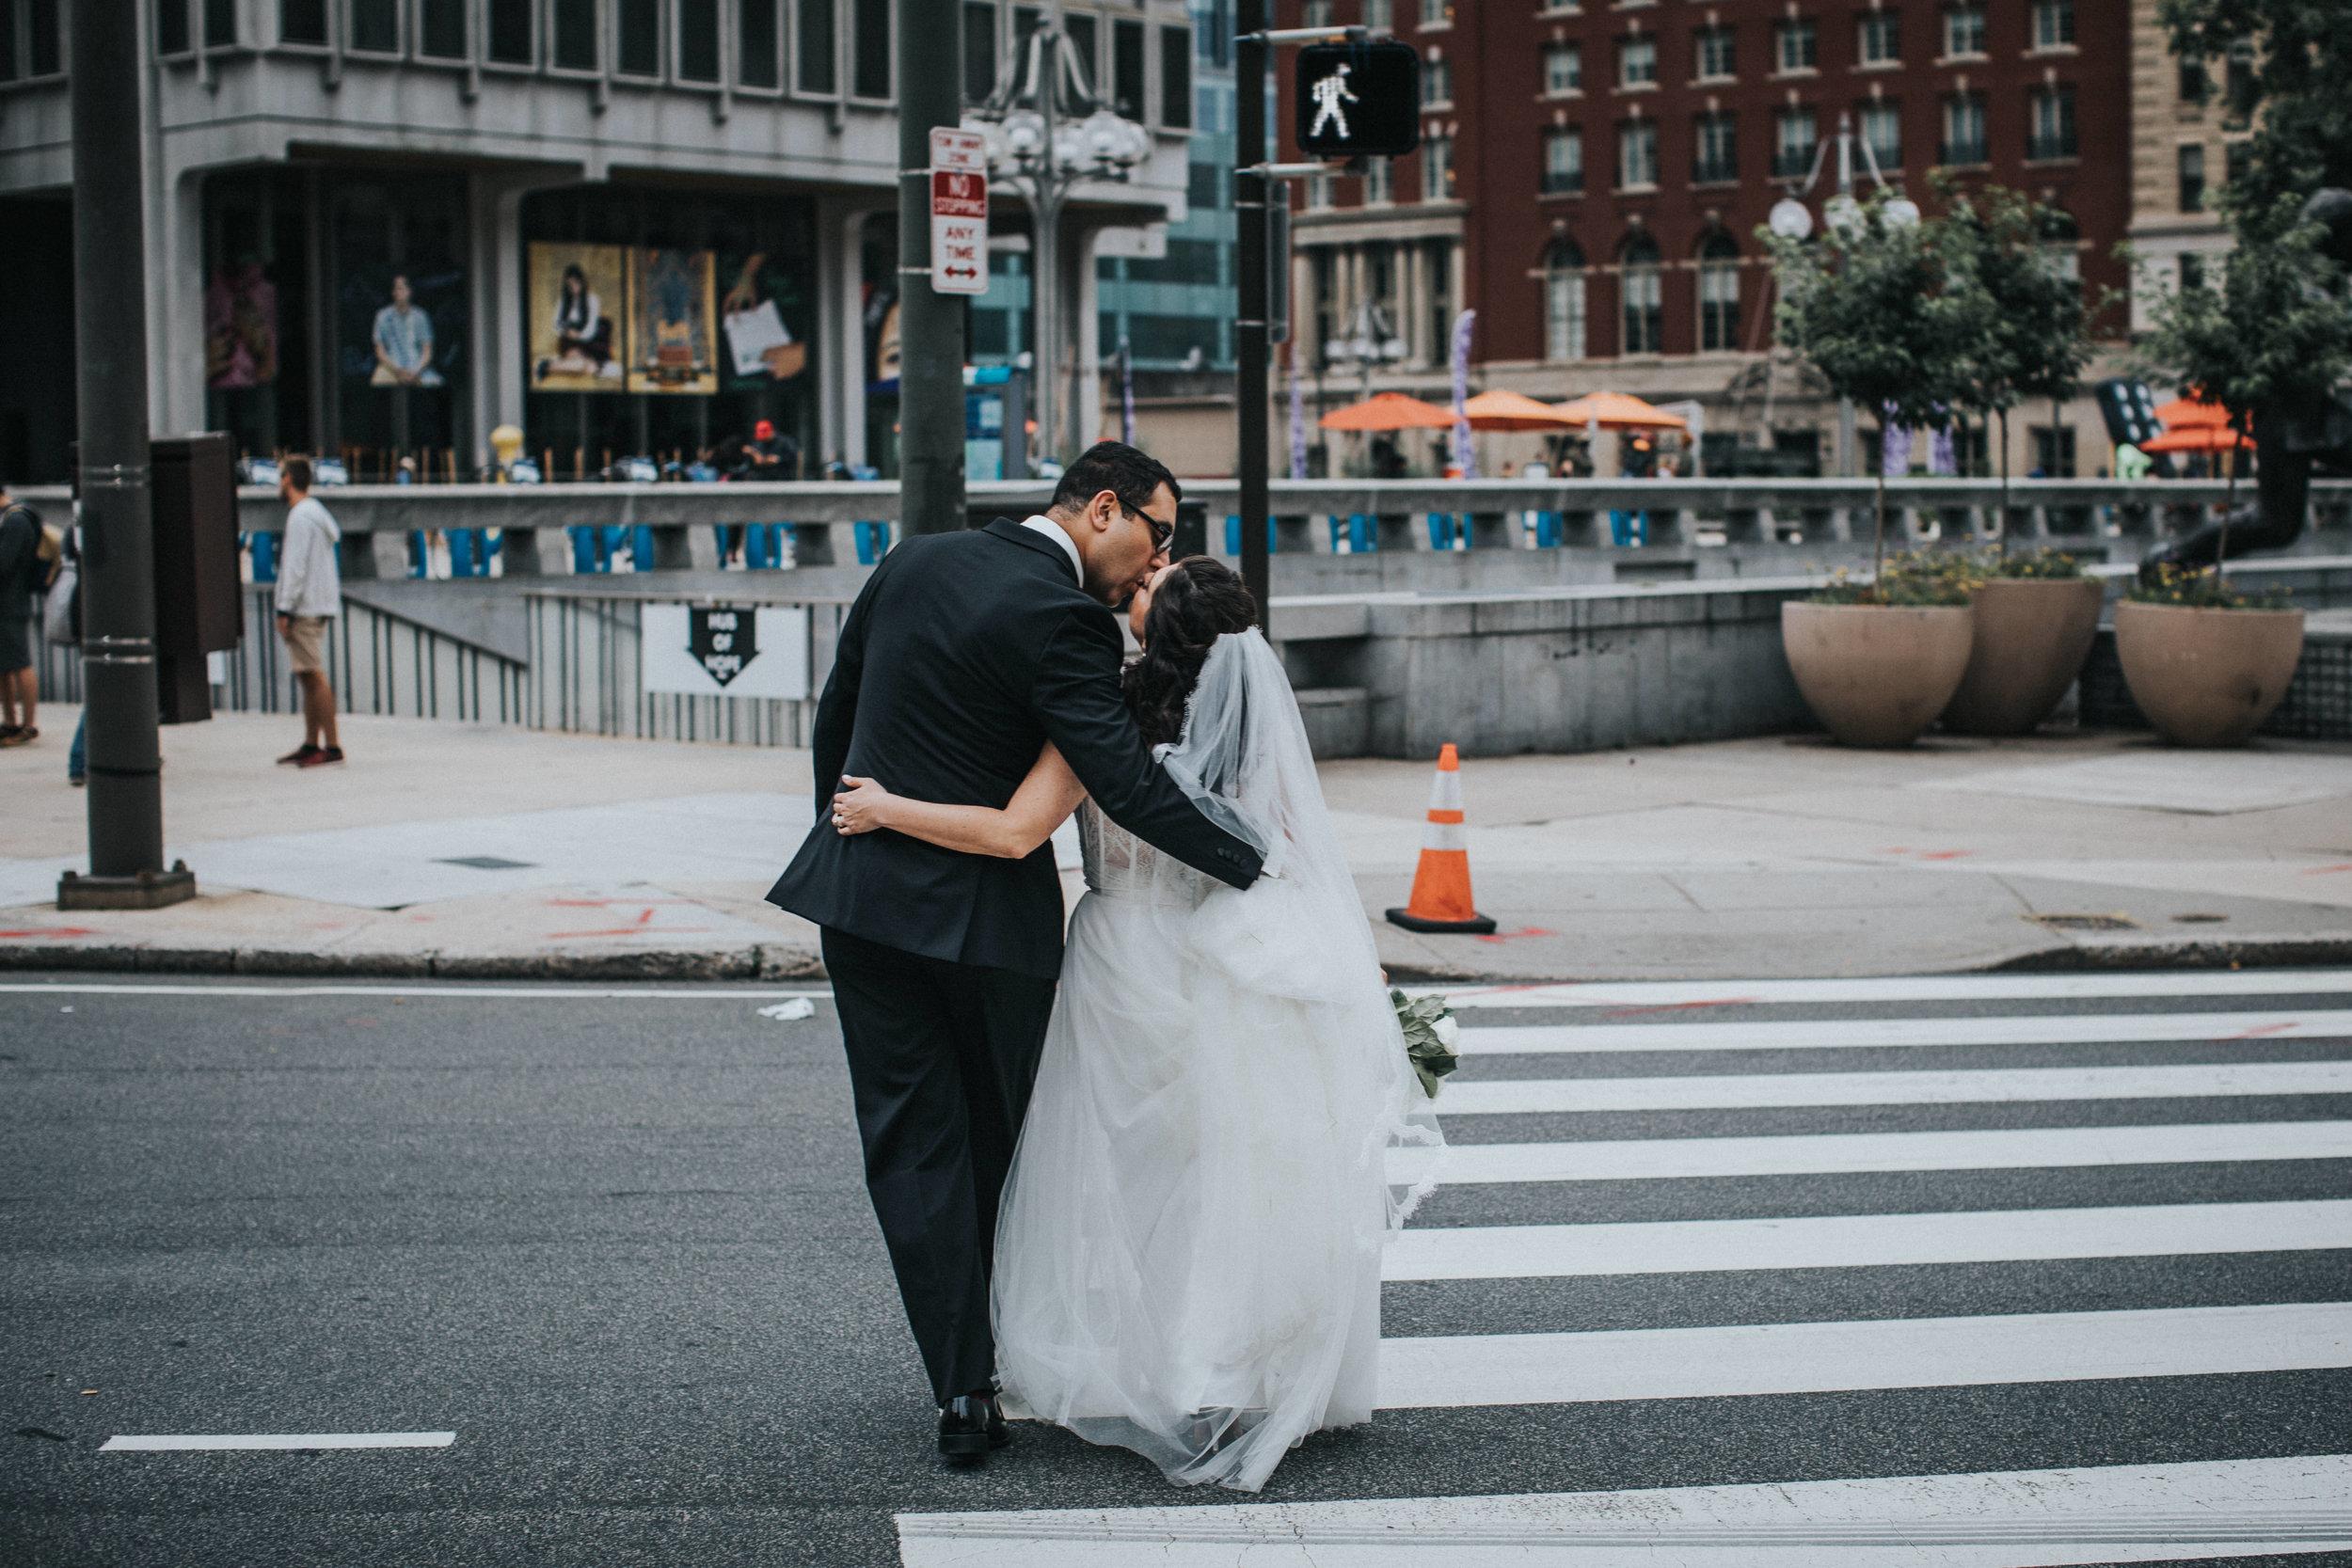 JennaLynnPhotography-NJWeddingPhotographer-Philadelphia-Wedding-ArtsBallroom-BridalParty-33.jpg